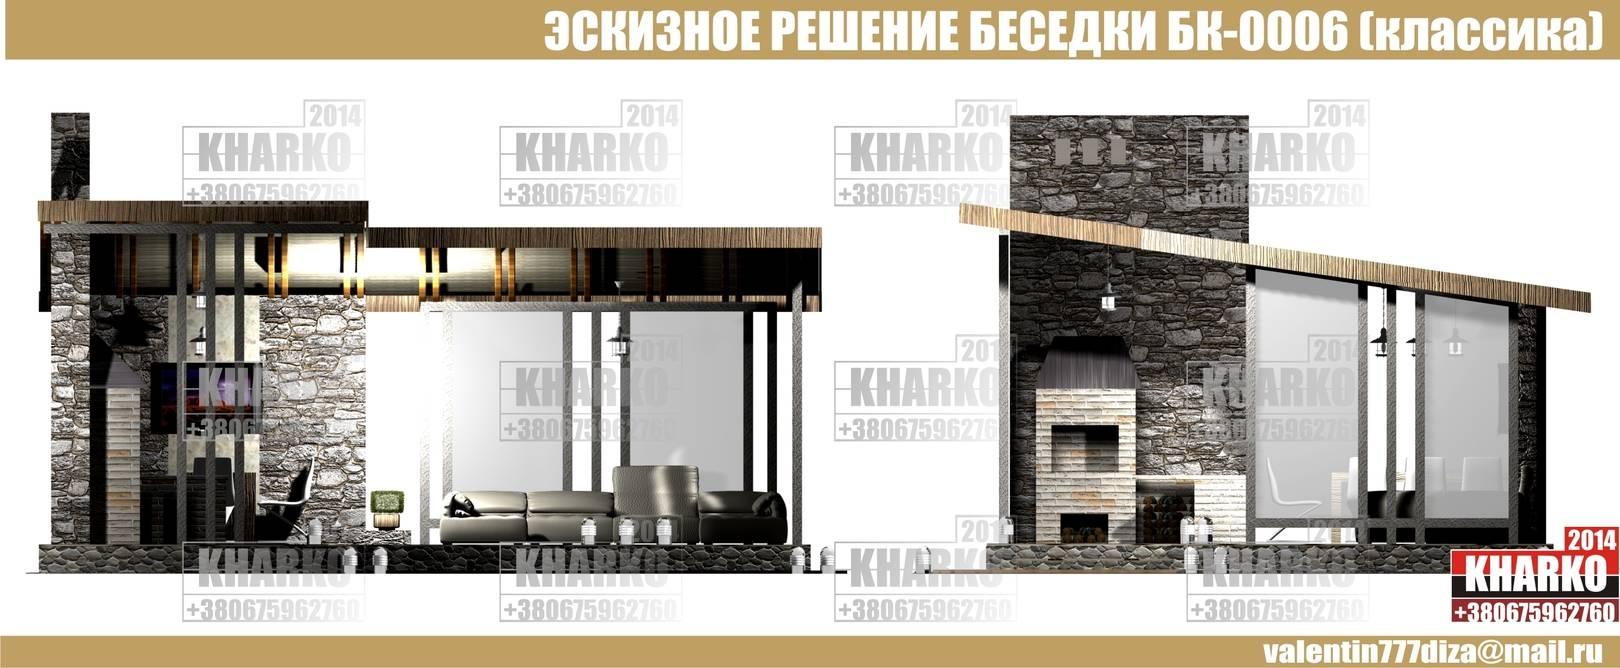 ПРОЕКТ БЕСЕДКИ БК-0007 (минимализм)